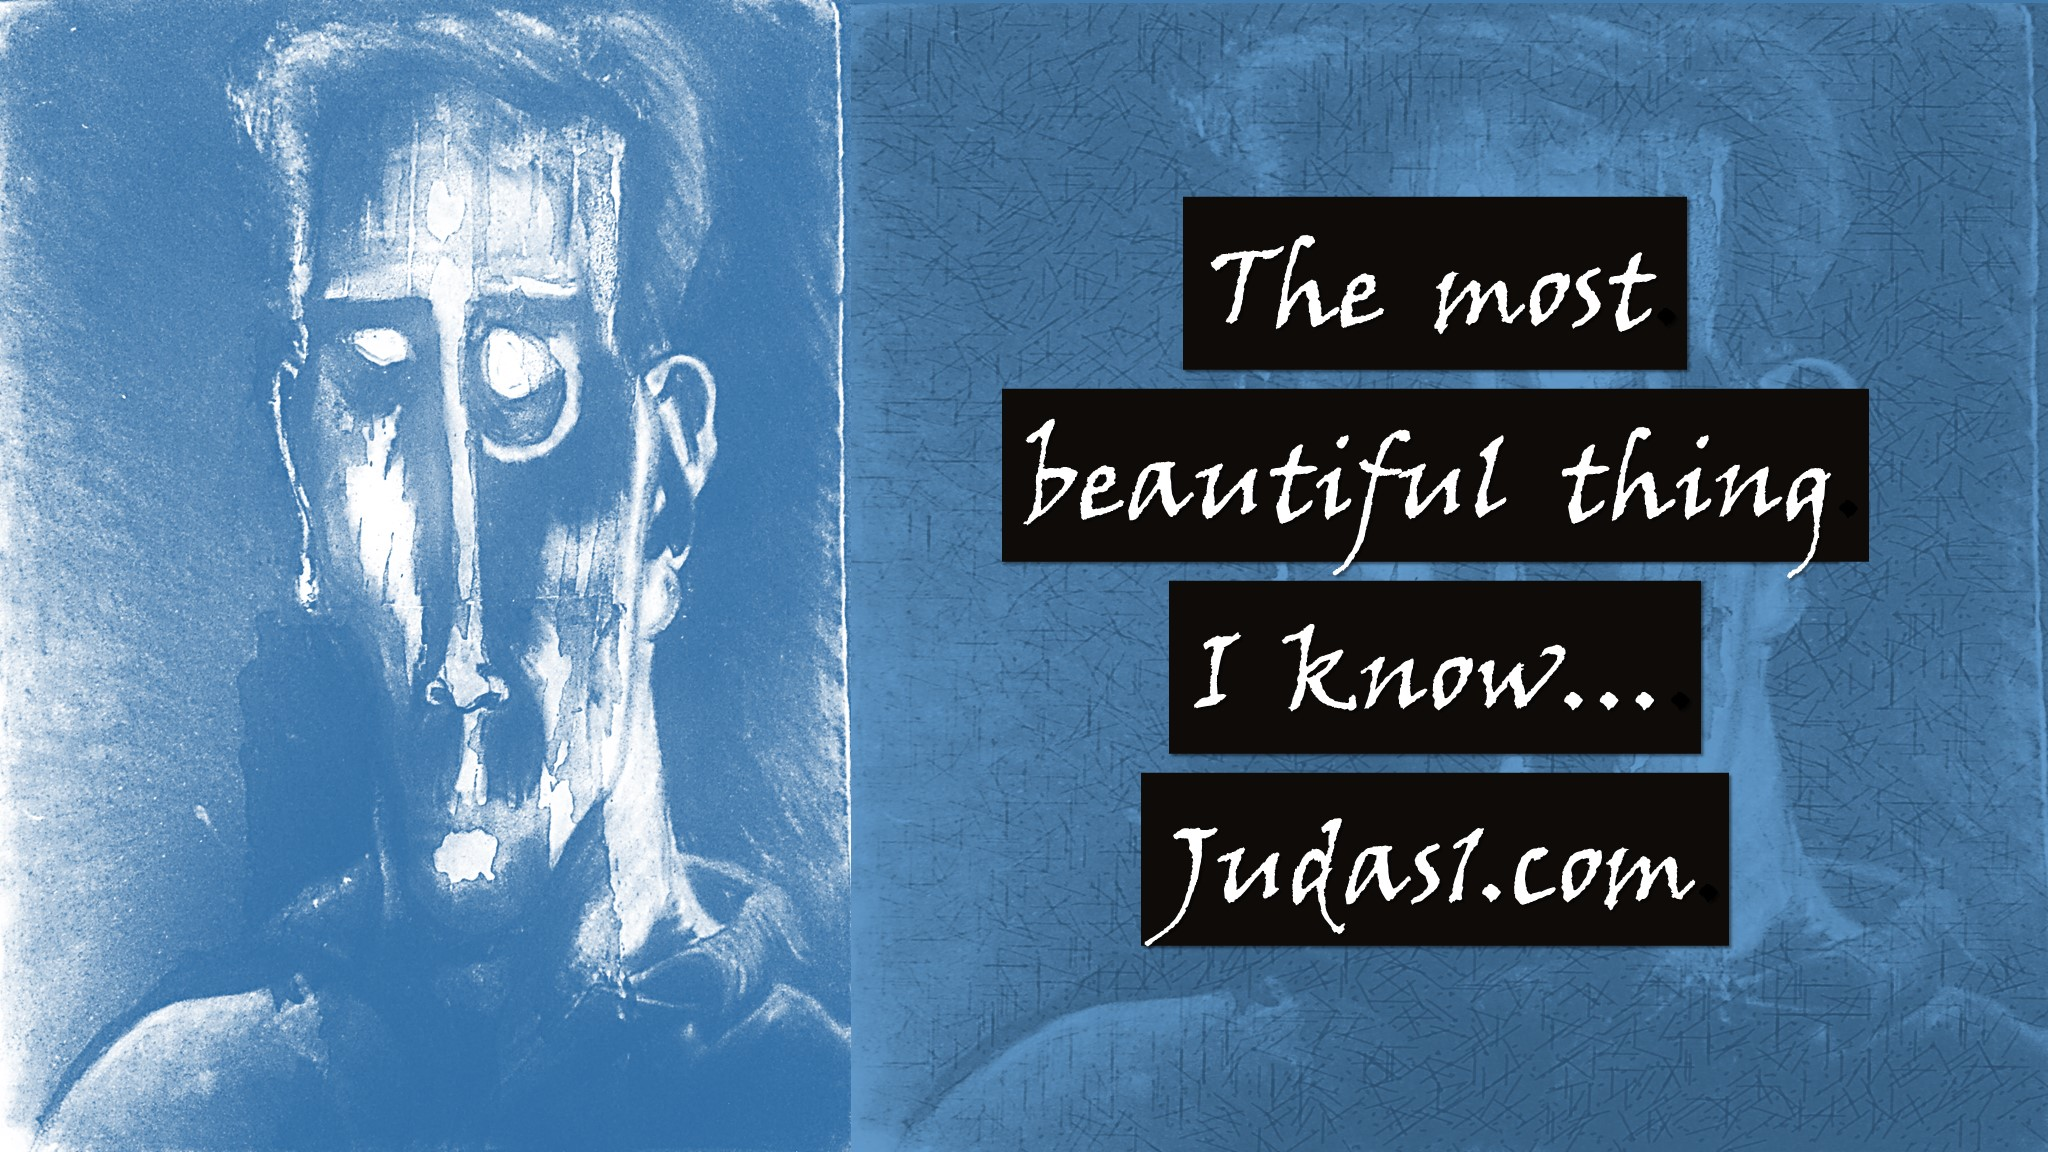 A loving god poem by Judas1